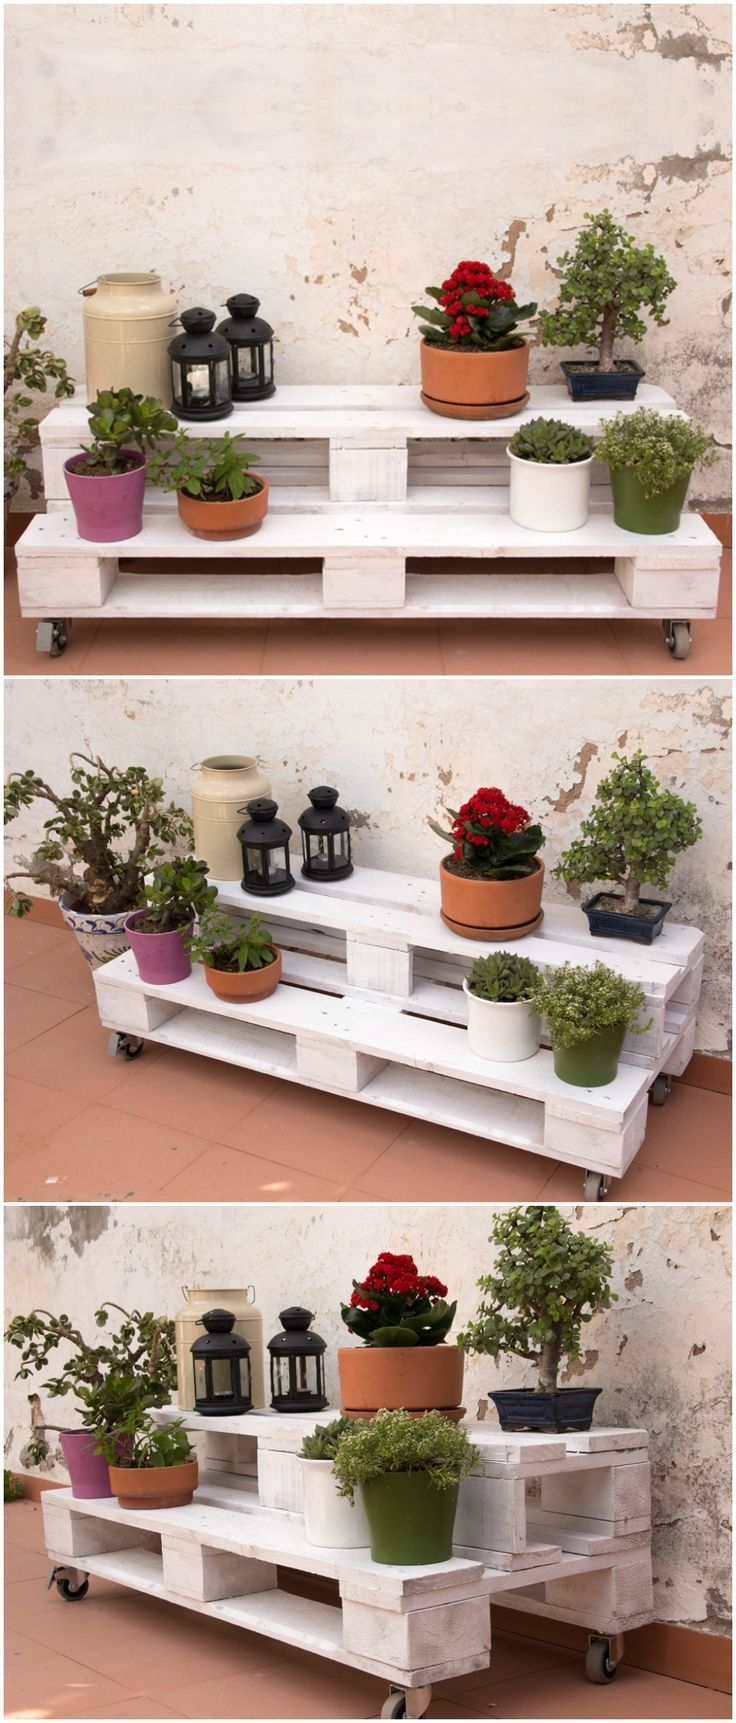 17 mejores ideas sobre jardinera de madera en pinterest - Palets decoracion jardin ...